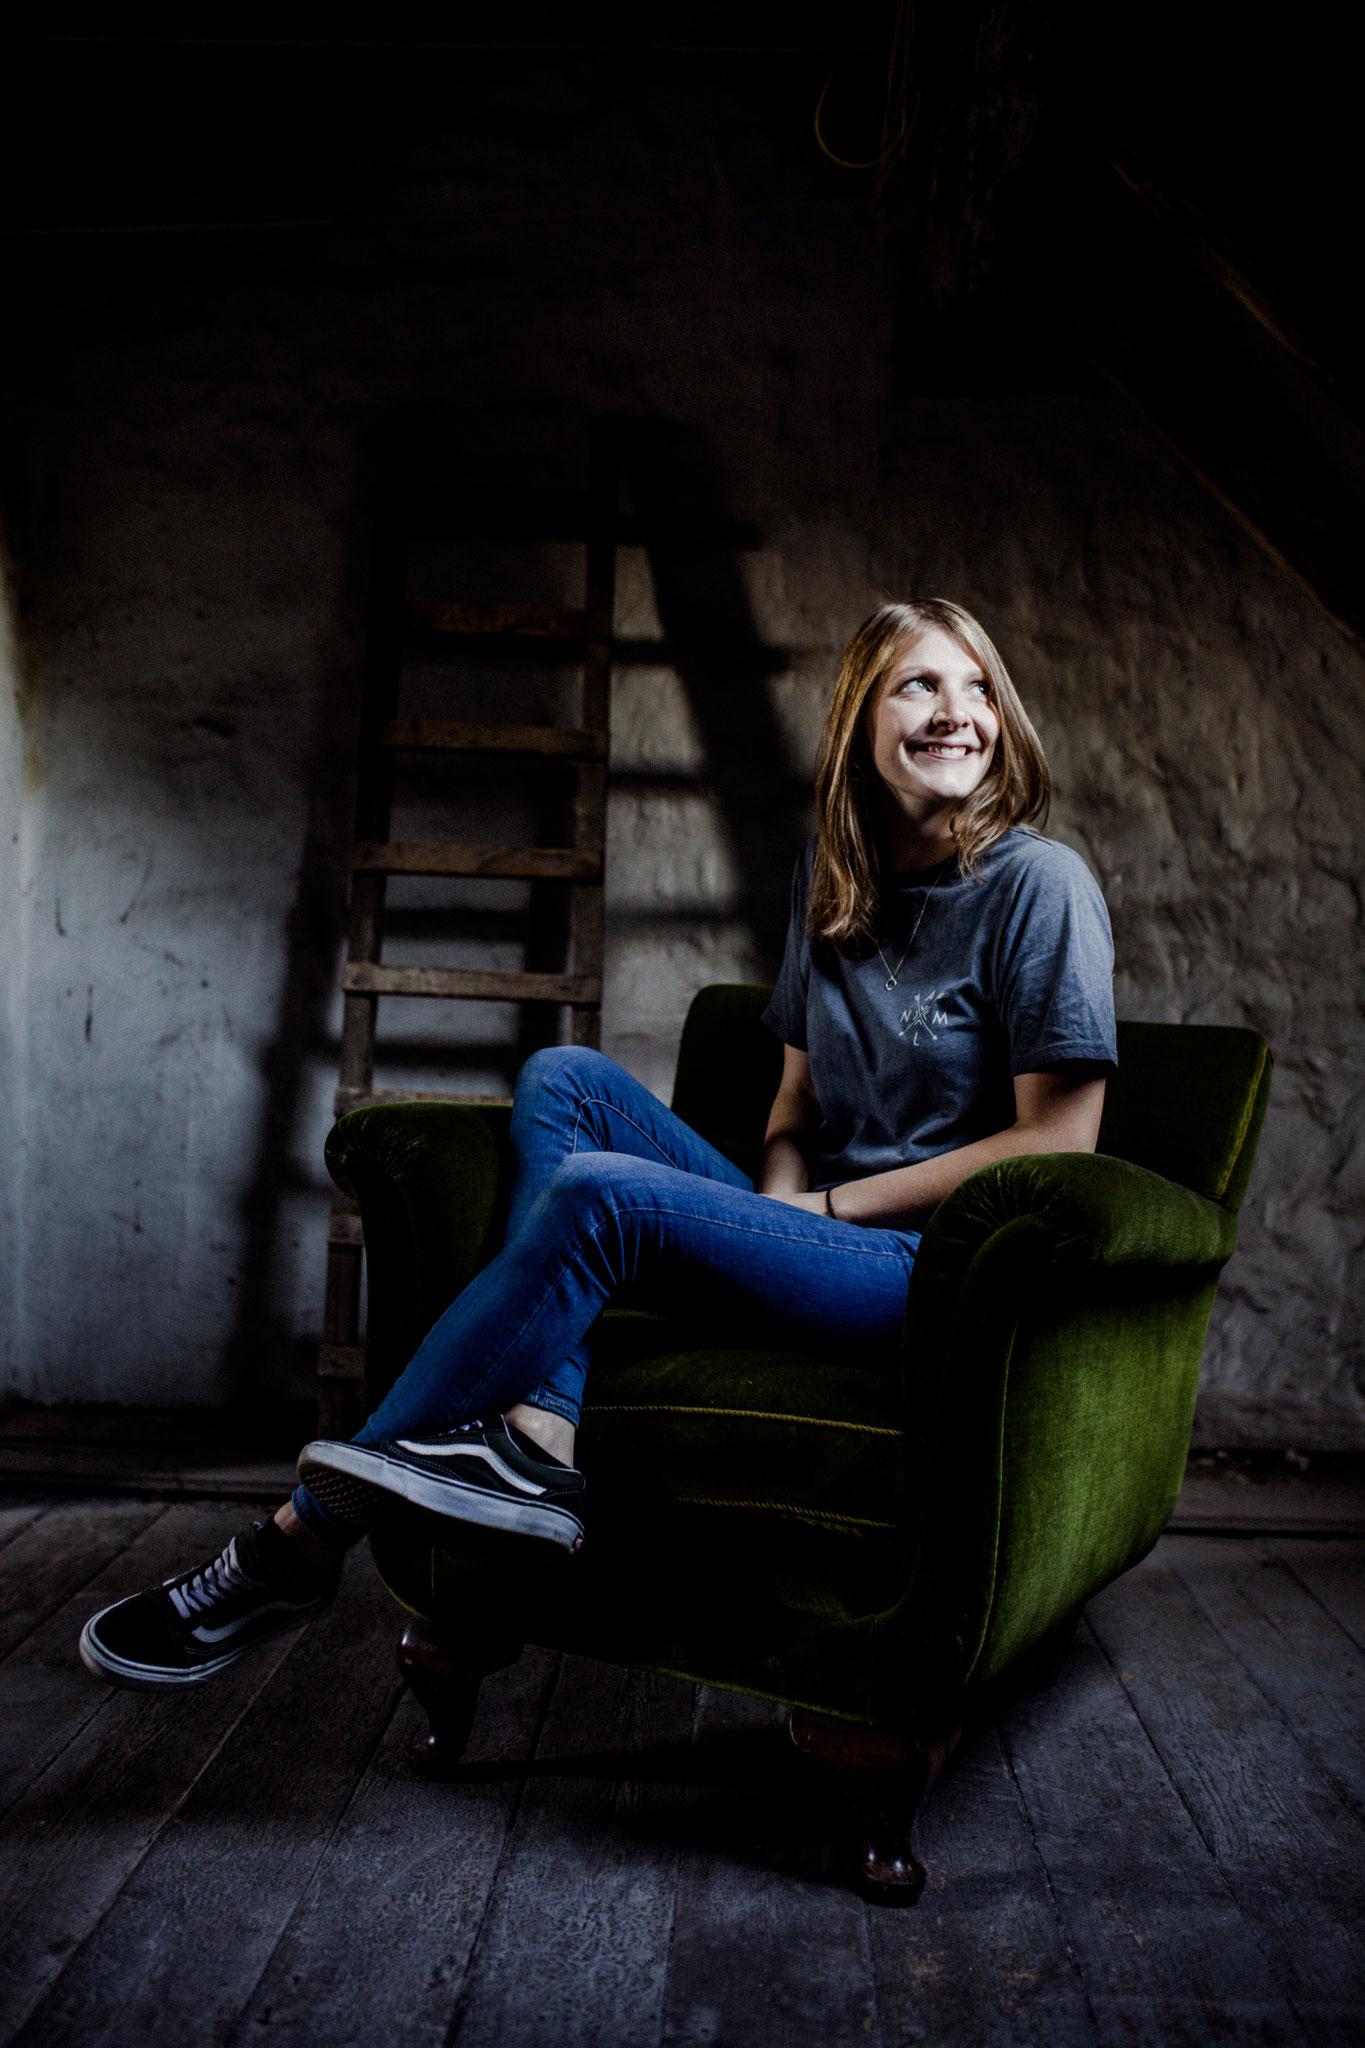 Portraitshooting, Homestory mit Anna, Portraitfotos im Ruhrgebiet, Essen | Düsseldorf | Köln